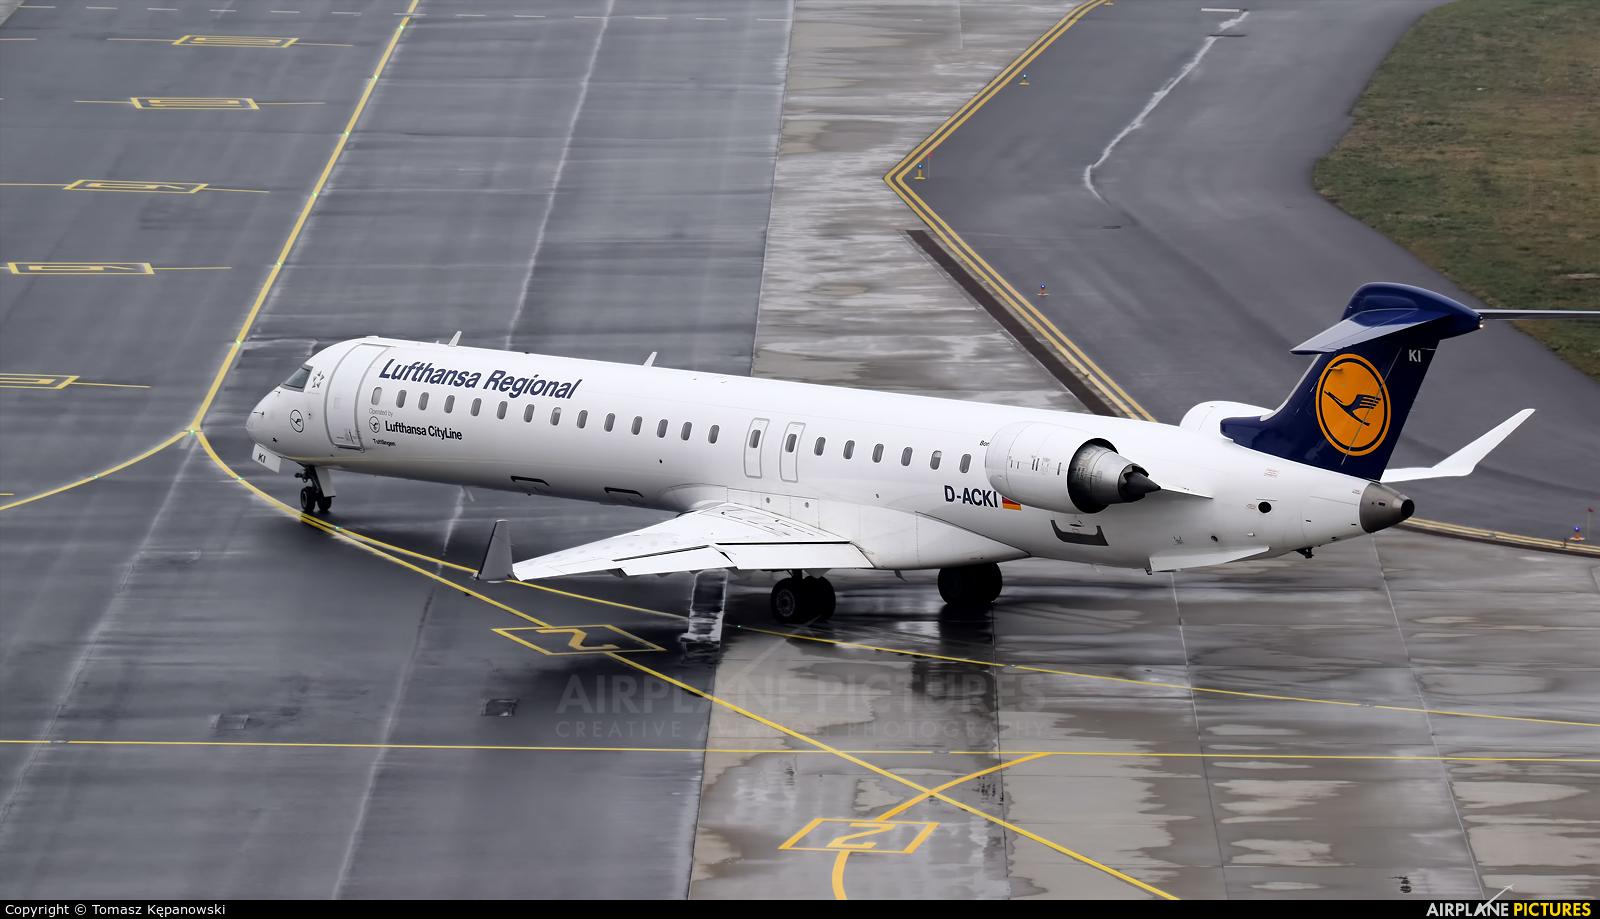 Lufthansa Regional - CityLine D-ACKI aircraft at Rzeszów-Jasionka